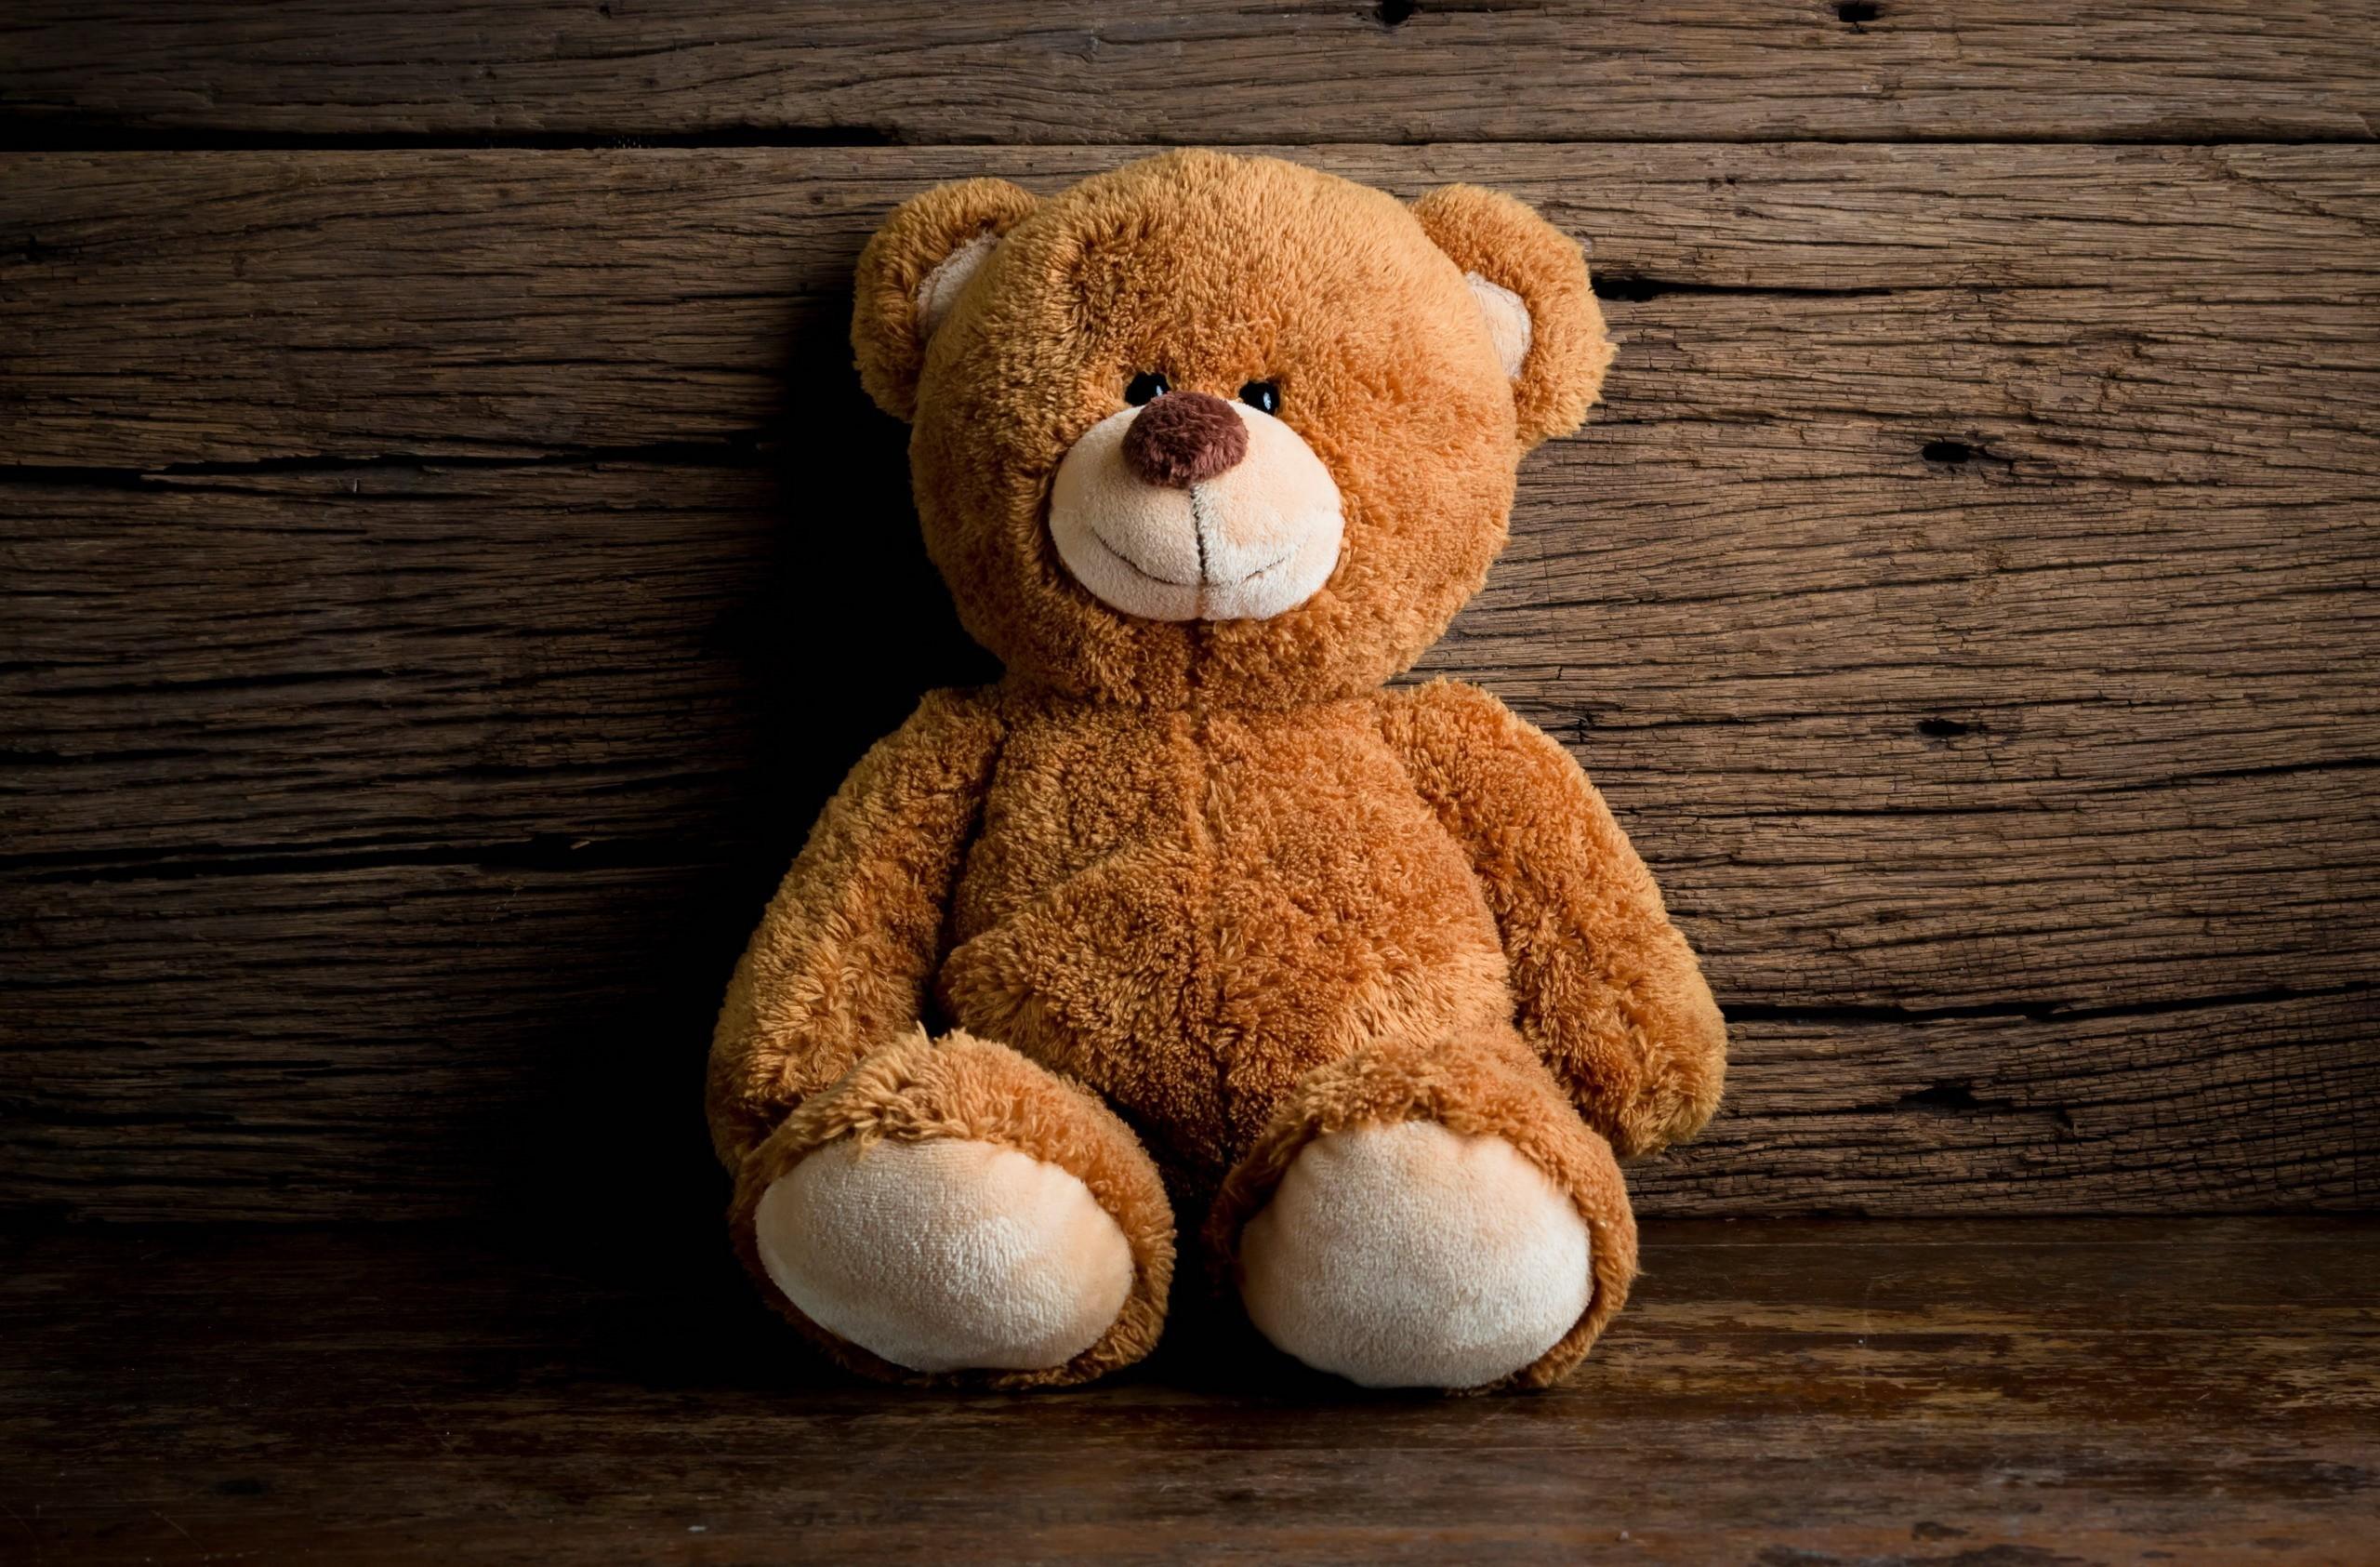 General 2560x1685 toys sitting portrait teddy bears model on the floor